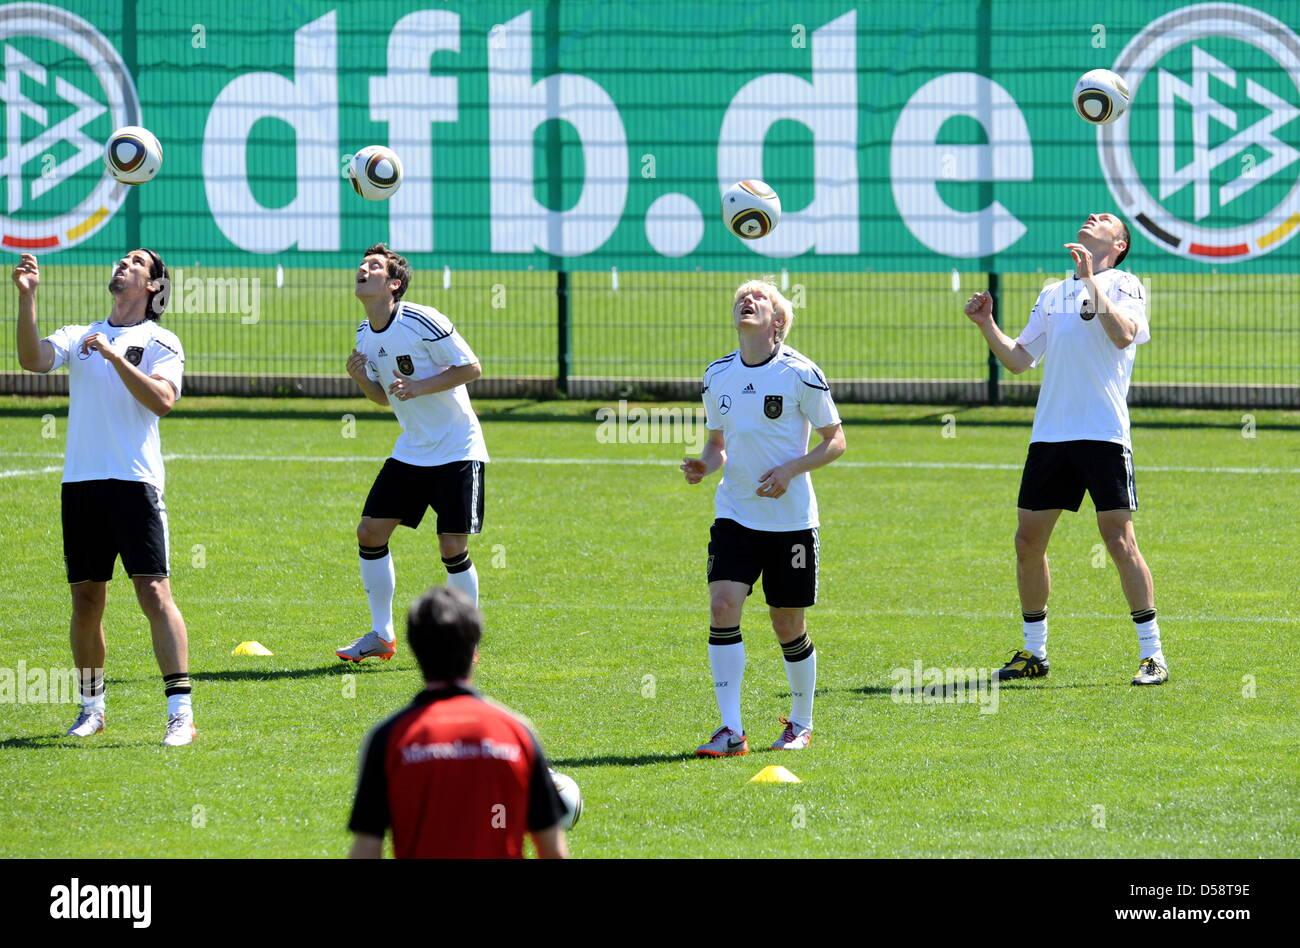 Sami Khedira And Mesut Ozil Stock Photos   Sami Khedira And Mesut ... bebc6ce934d95